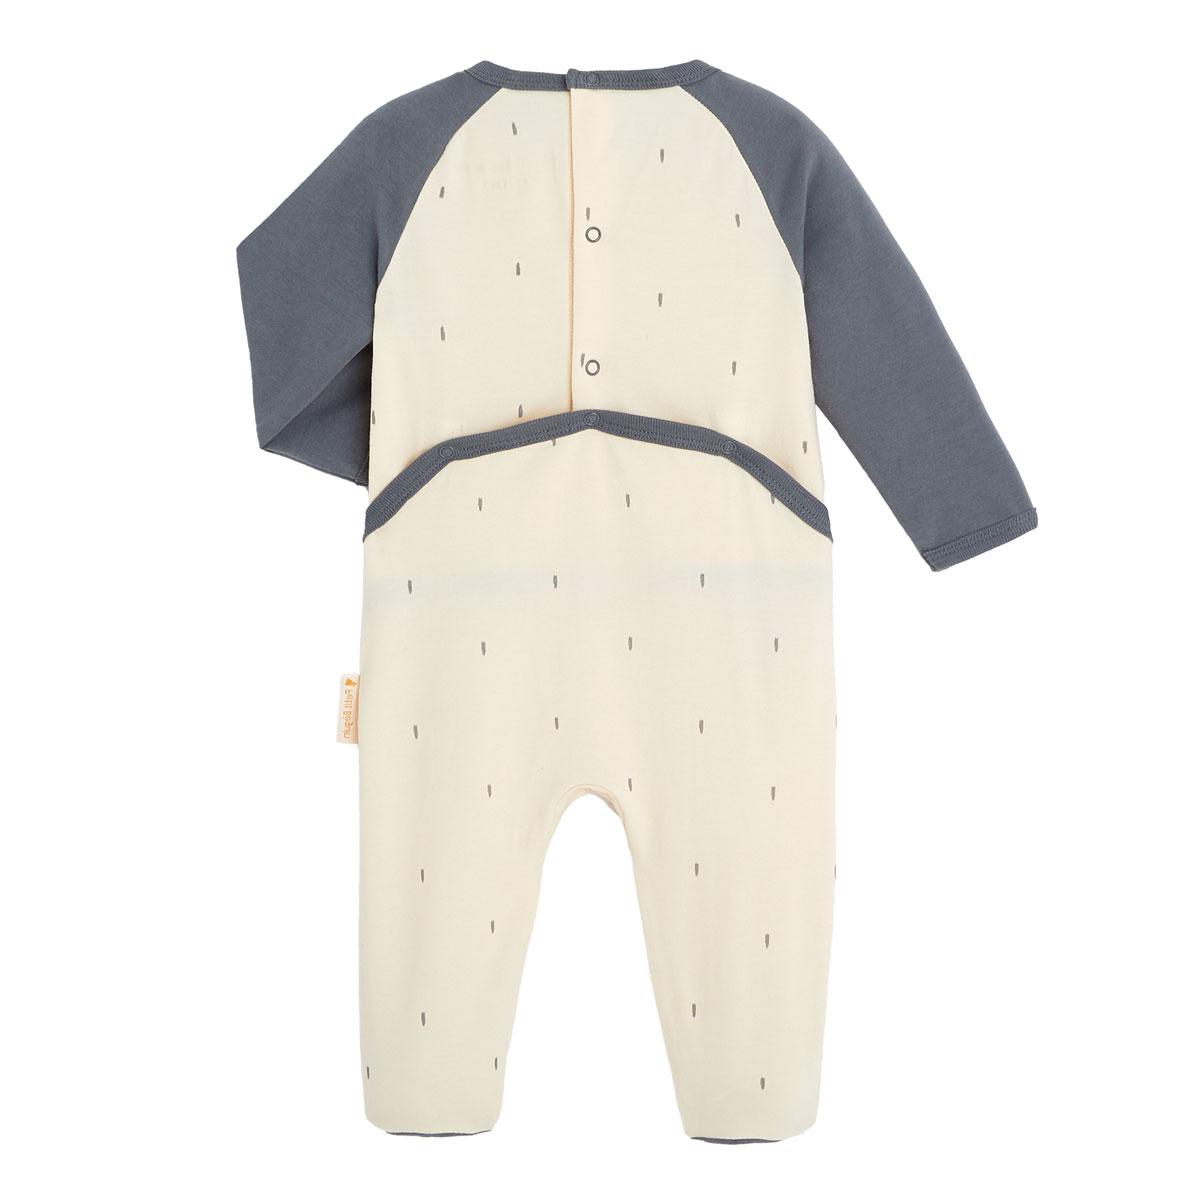 Pyjama bébé contenant du coton bio Aloha Havana dos